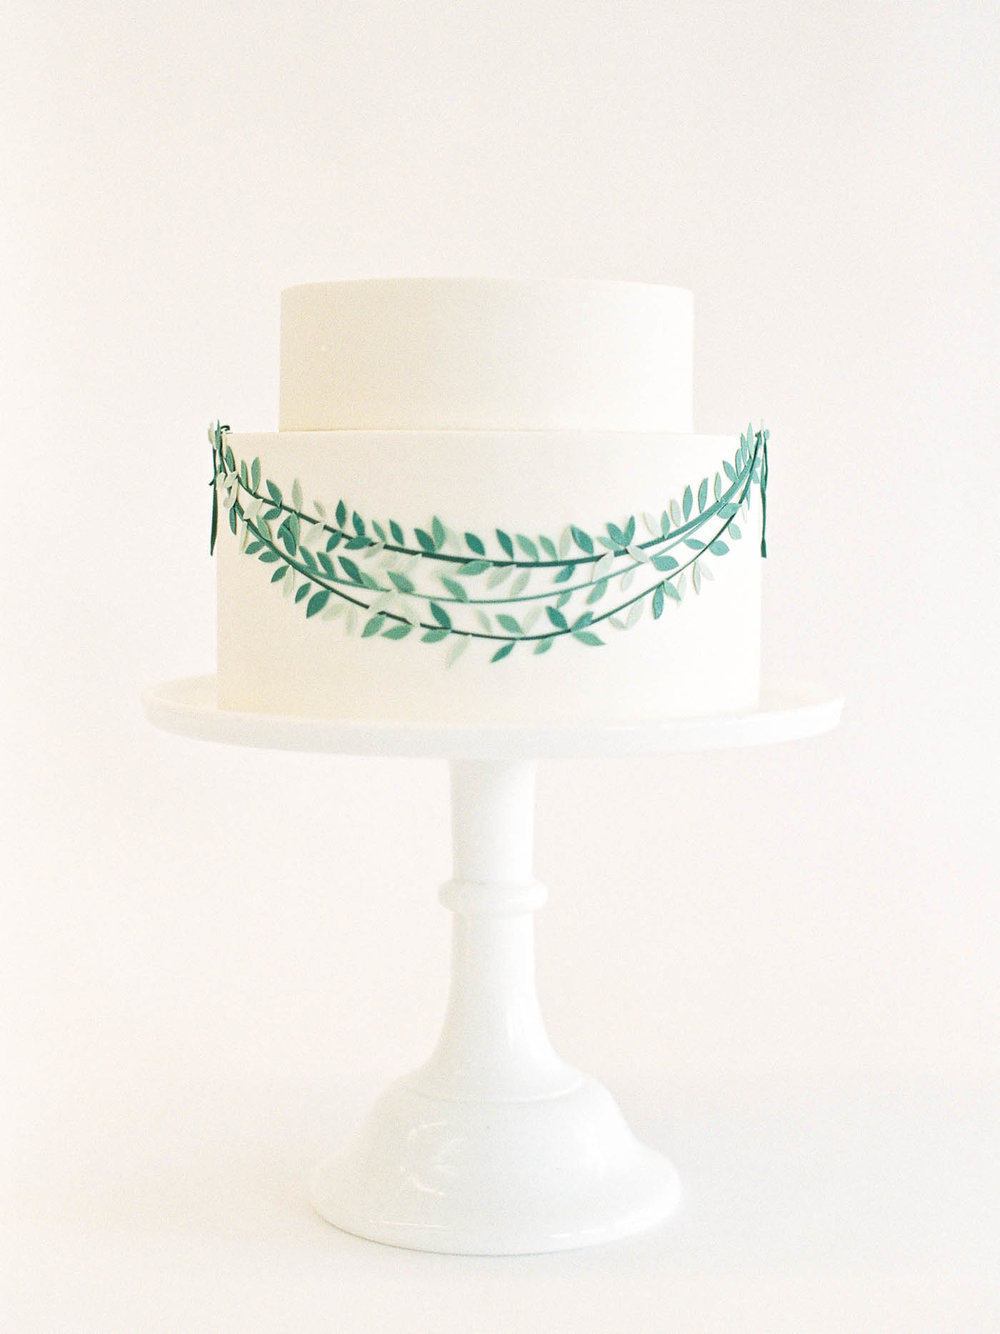 Delicate-Wedding-Cakes-12-Jen_Huang-002343-R1-014.jpg